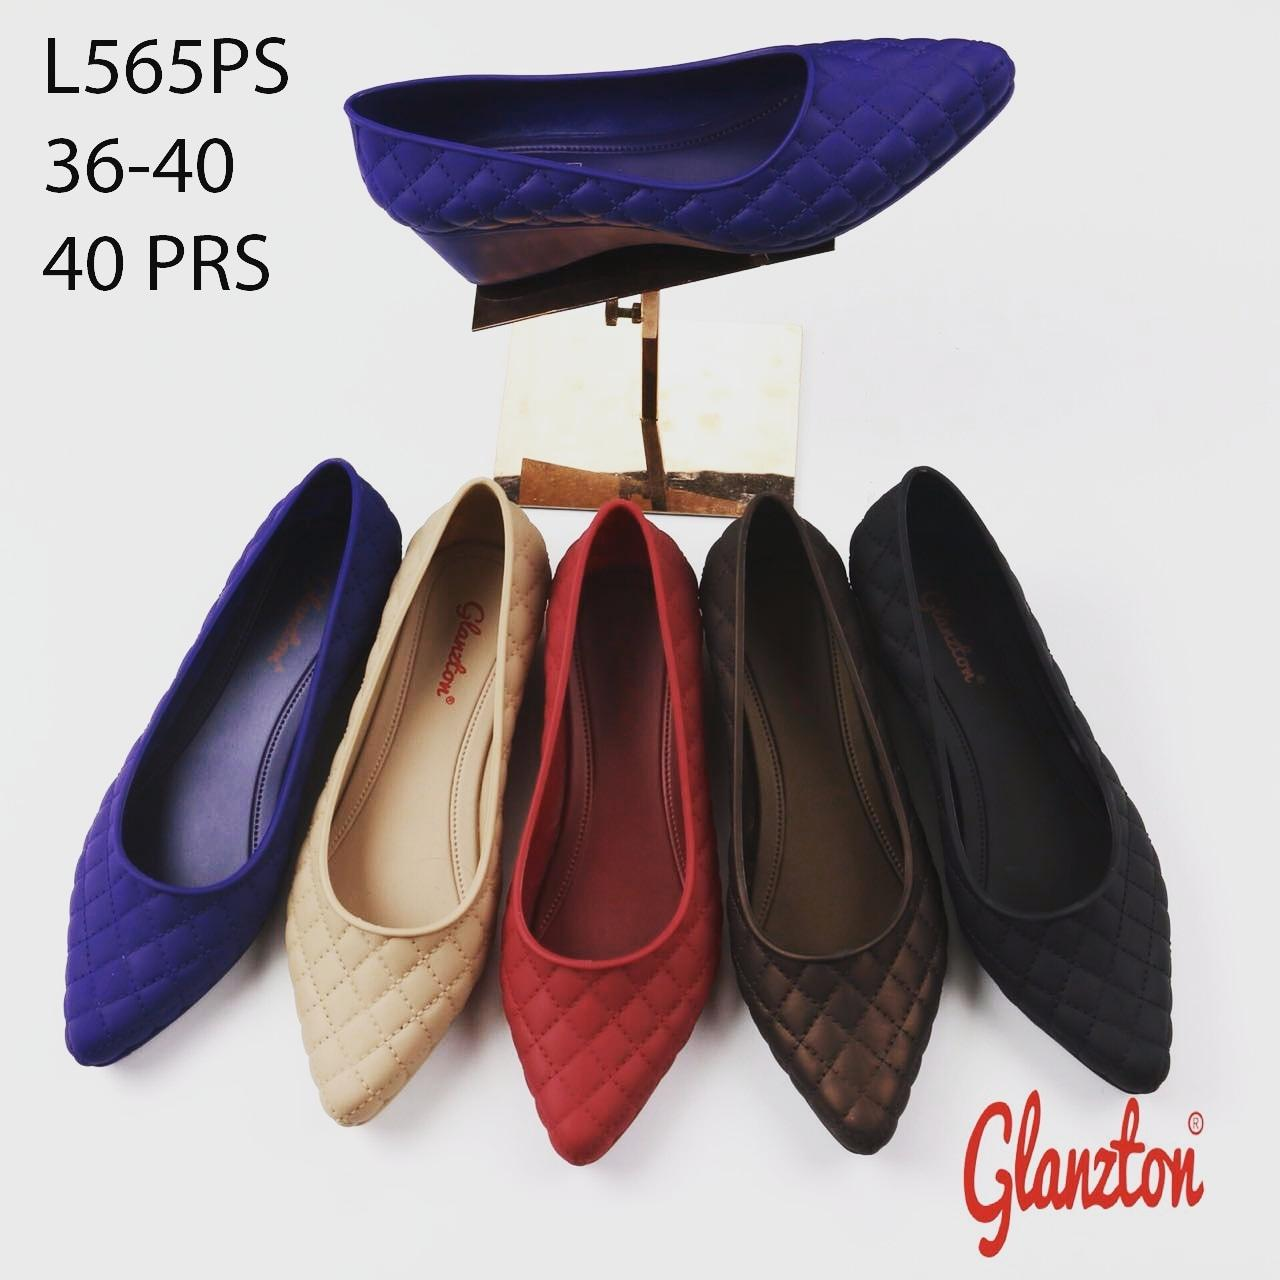 Jual Sandal Sepatu Wedges Flat Lady Jelly Shoes Sendal Wanita Myanka Meizu